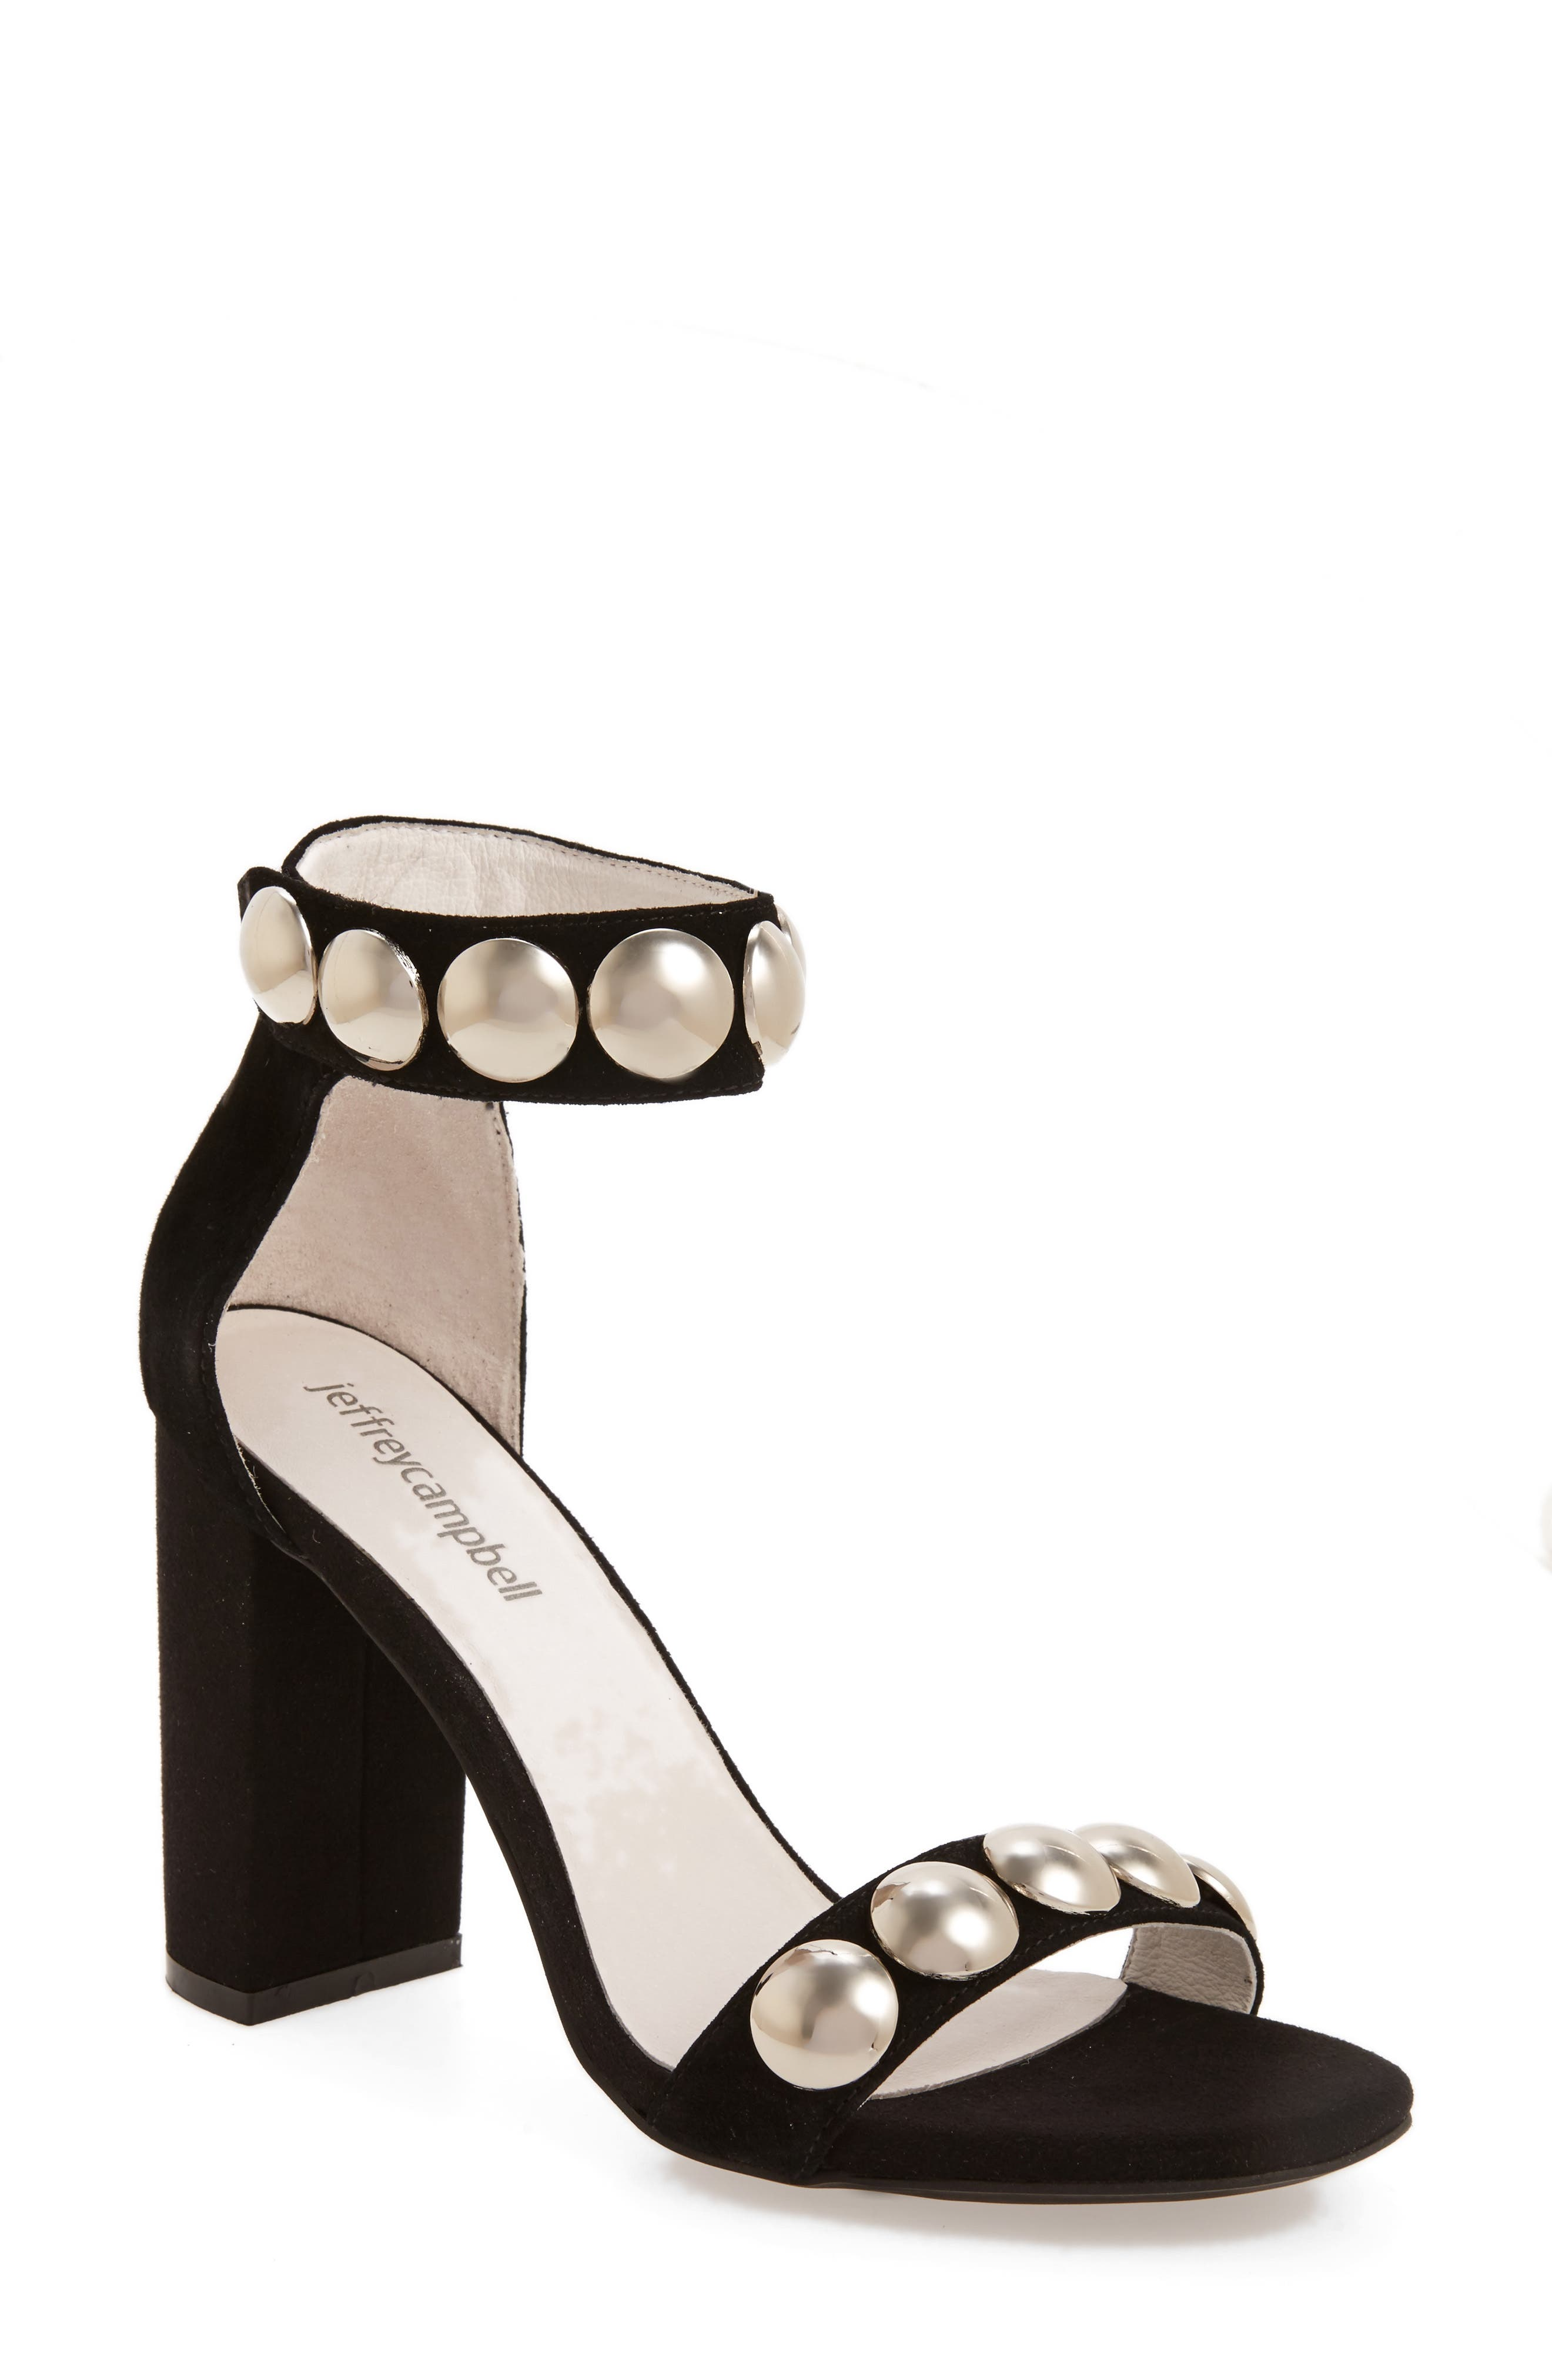 Alternate Image 1 Selected - Jeffrey Campbell Lindsay Dome Studded Sandal (Women)